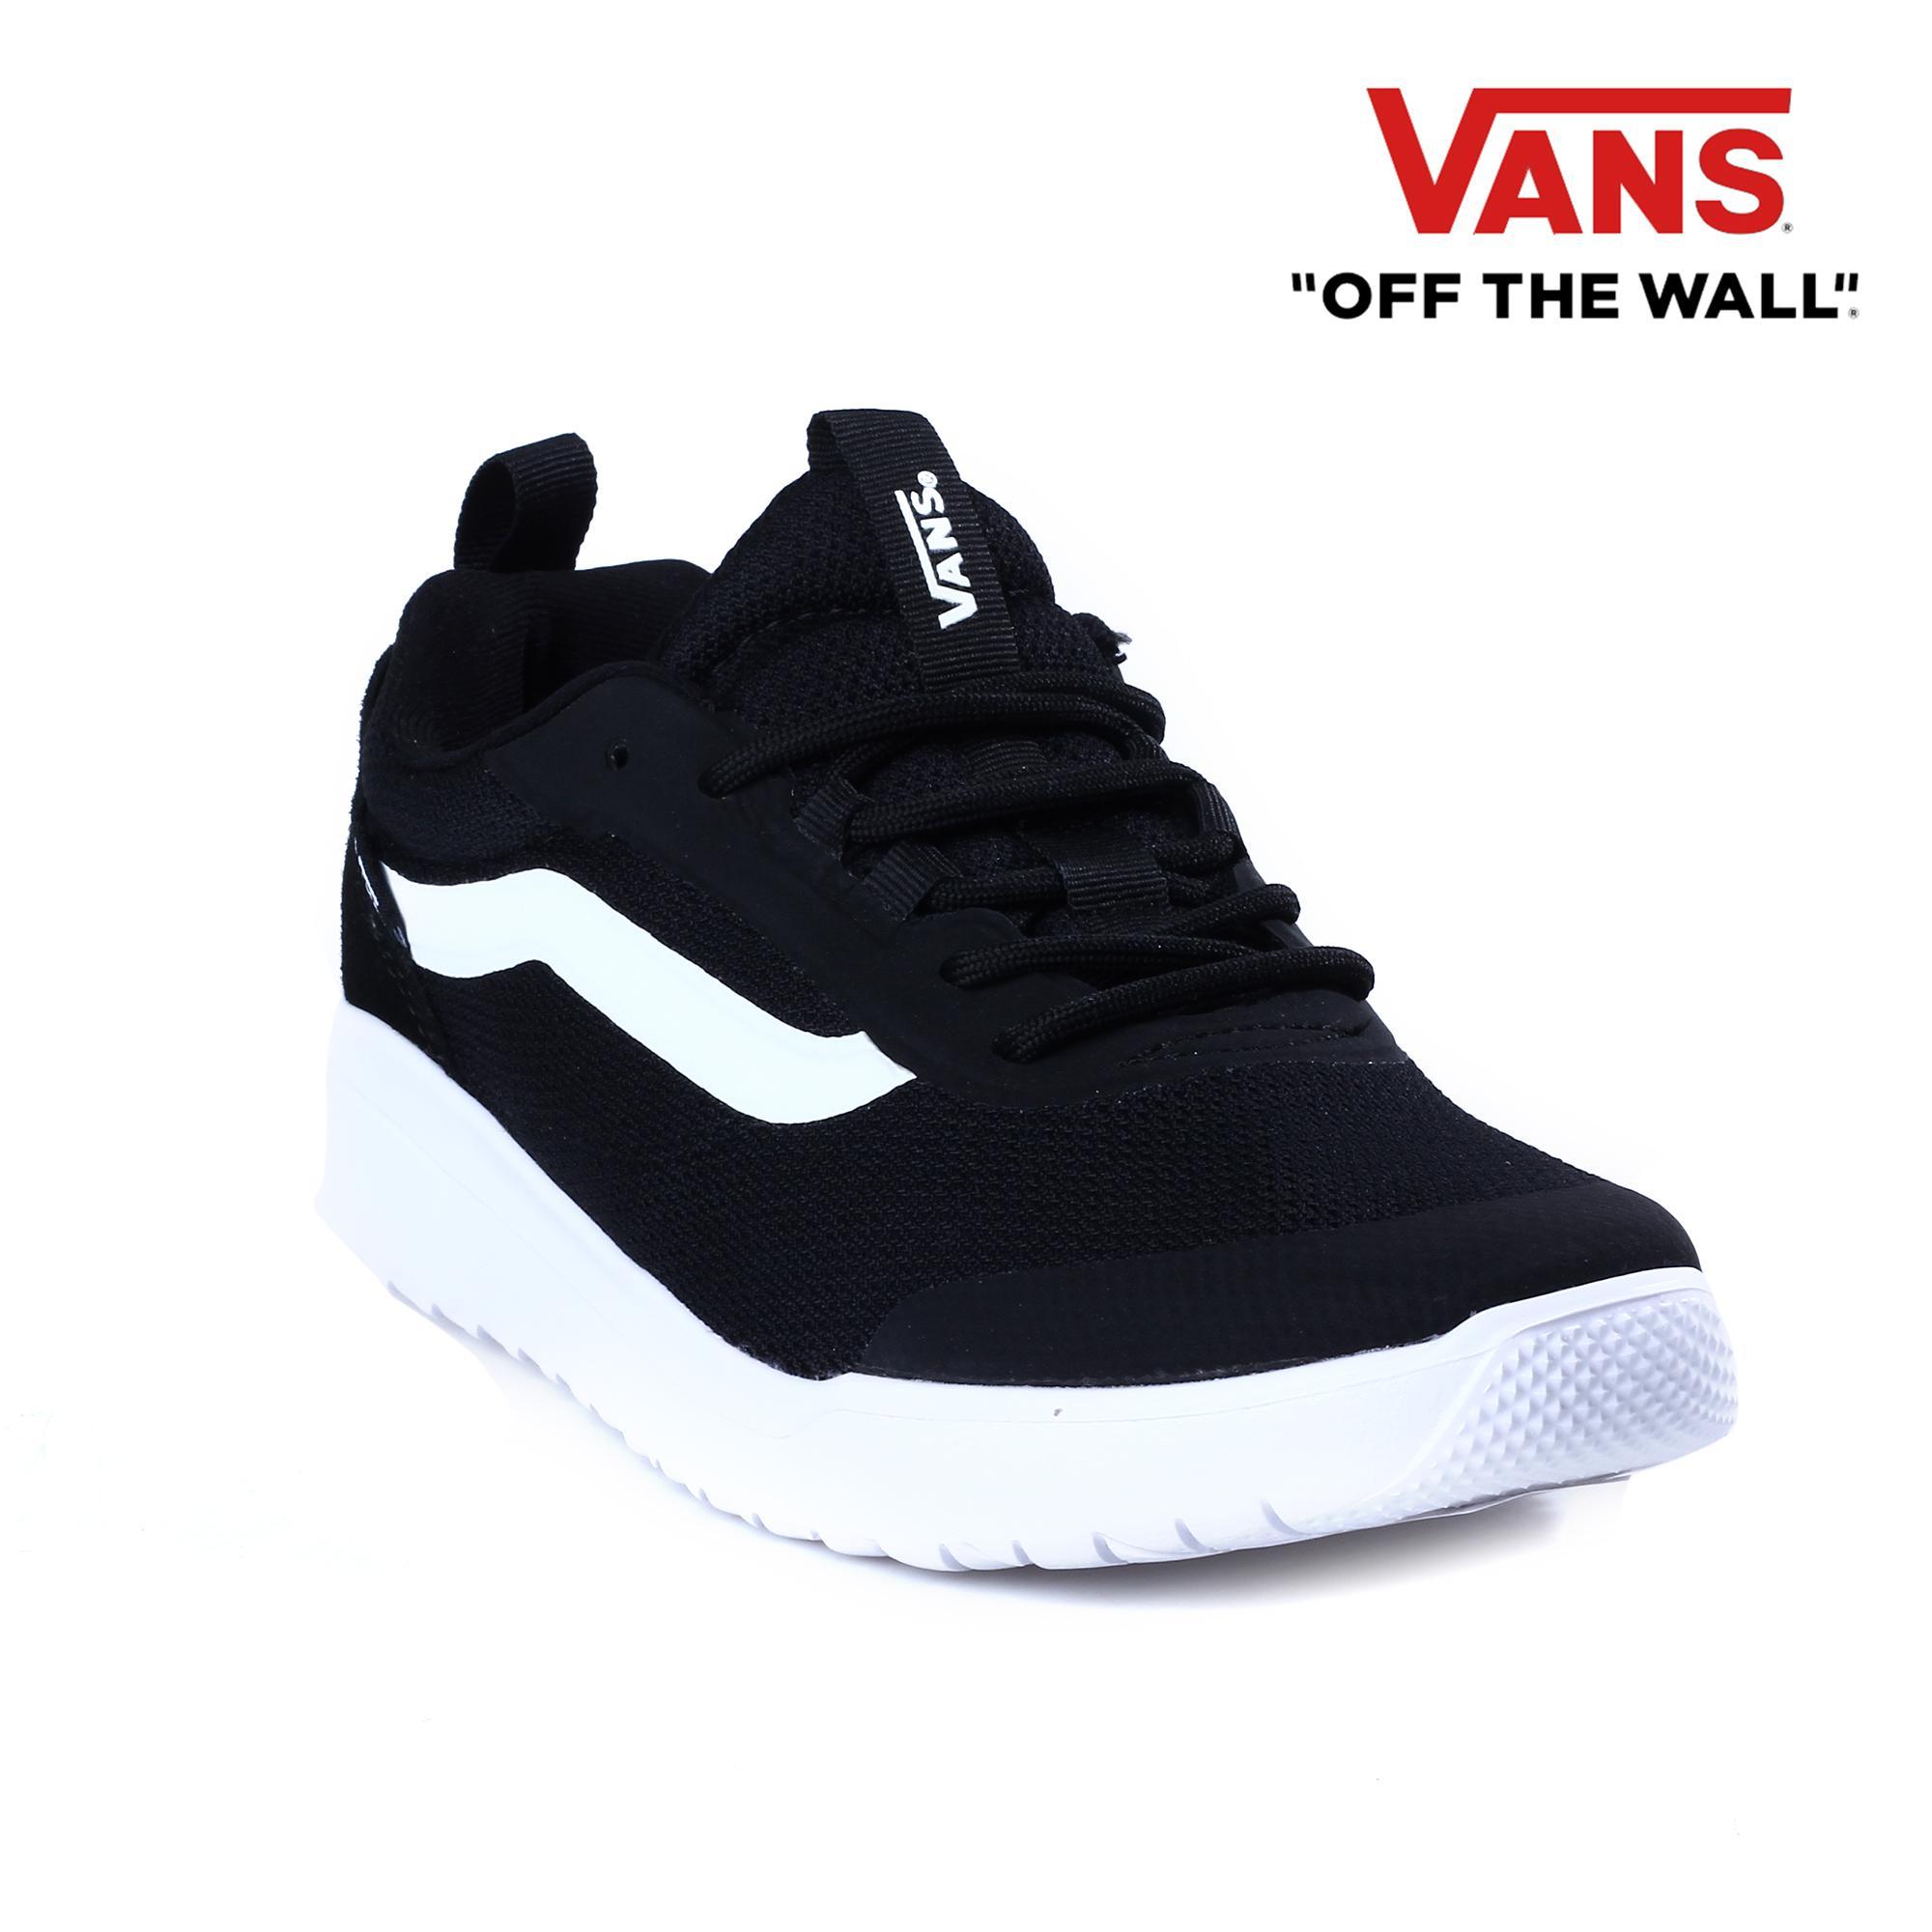 baab427a Vans Men's Cerus RW Mesh Sneakers